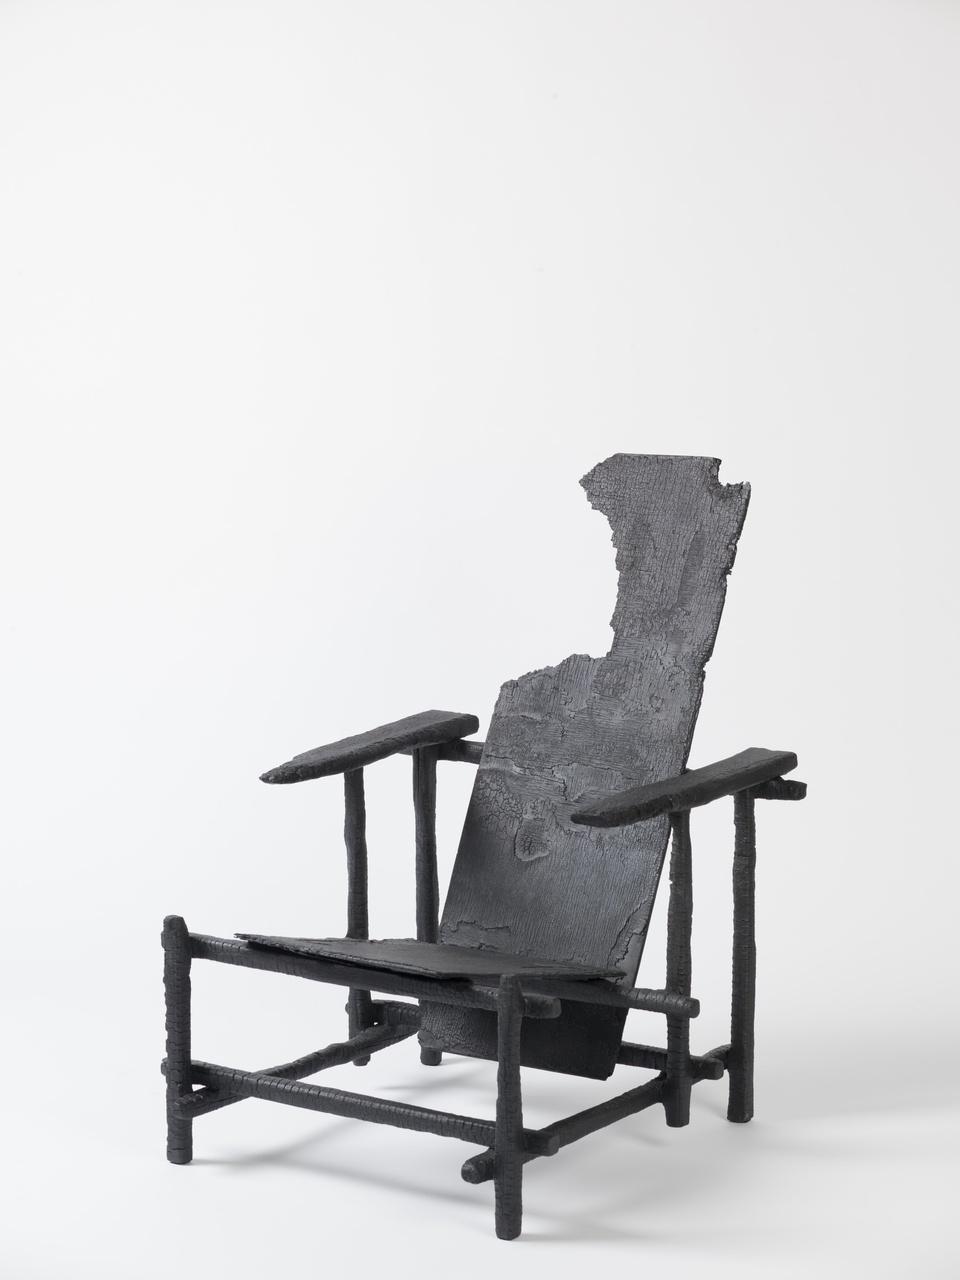 'Smoke' Red Blue chair